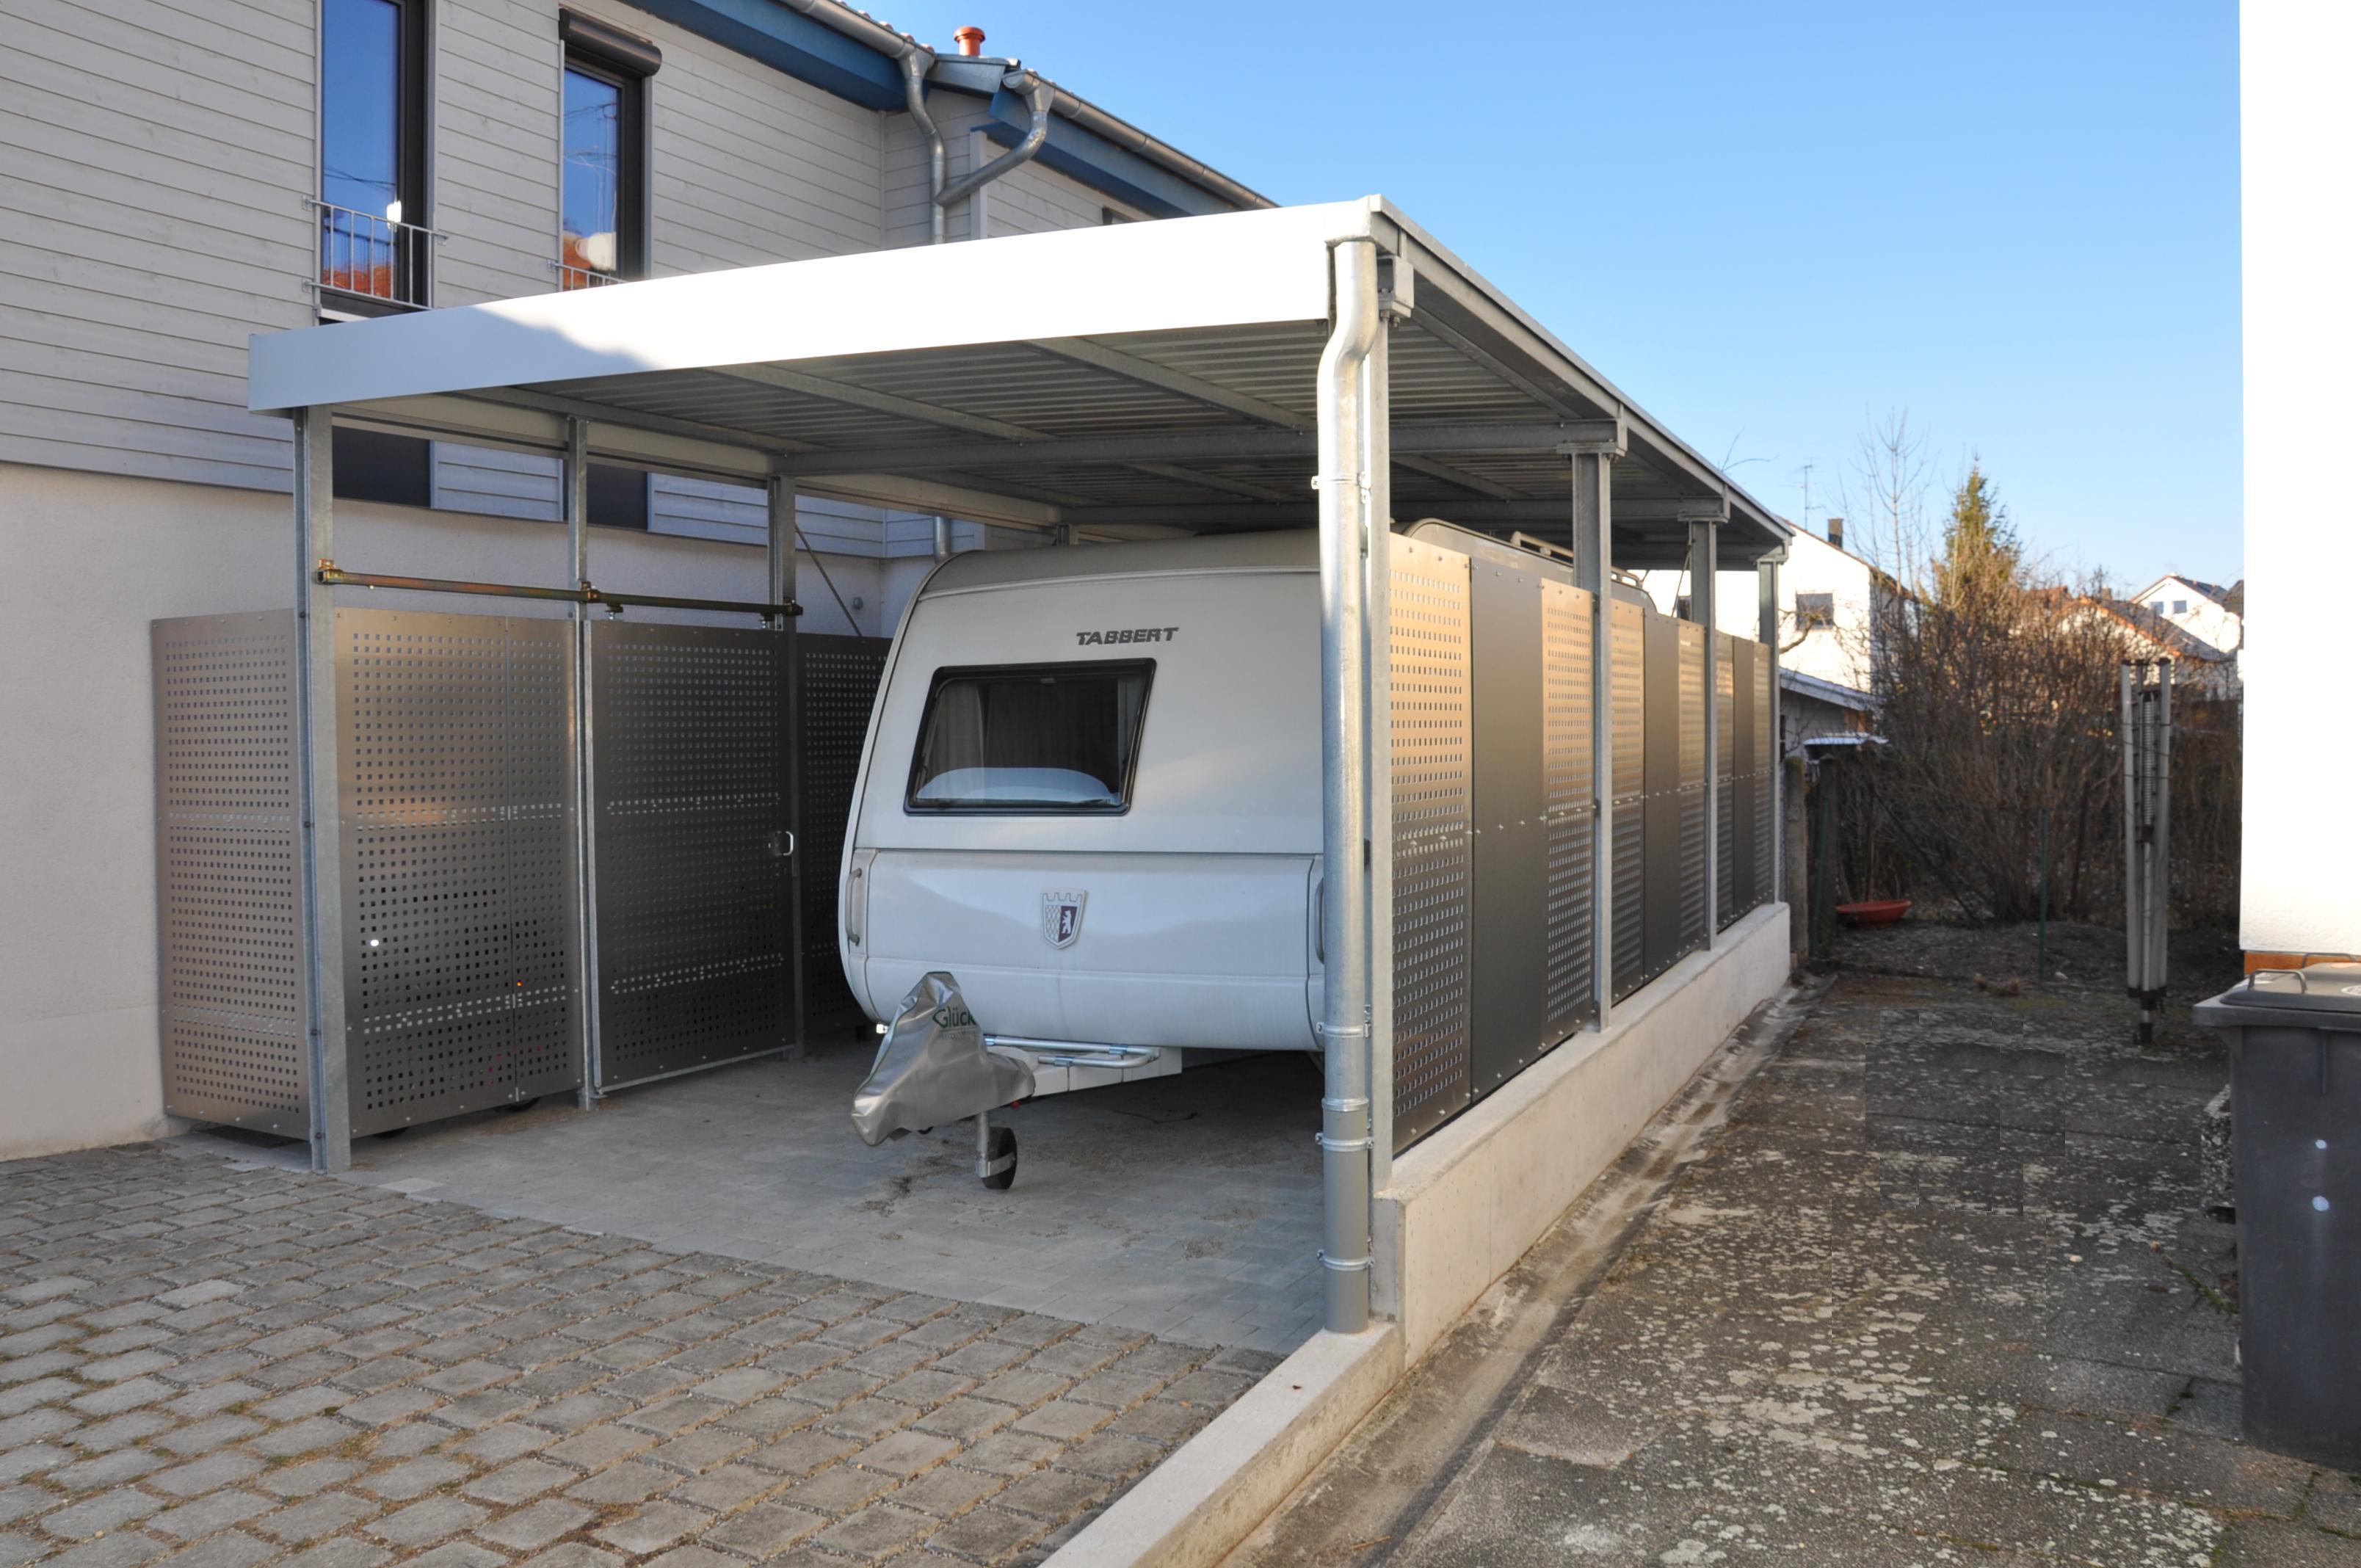 carport mit abstellraum lochblechverkleidung stahlbau n gele. Black Bedroom Furniture Sets. Home Design Ideas